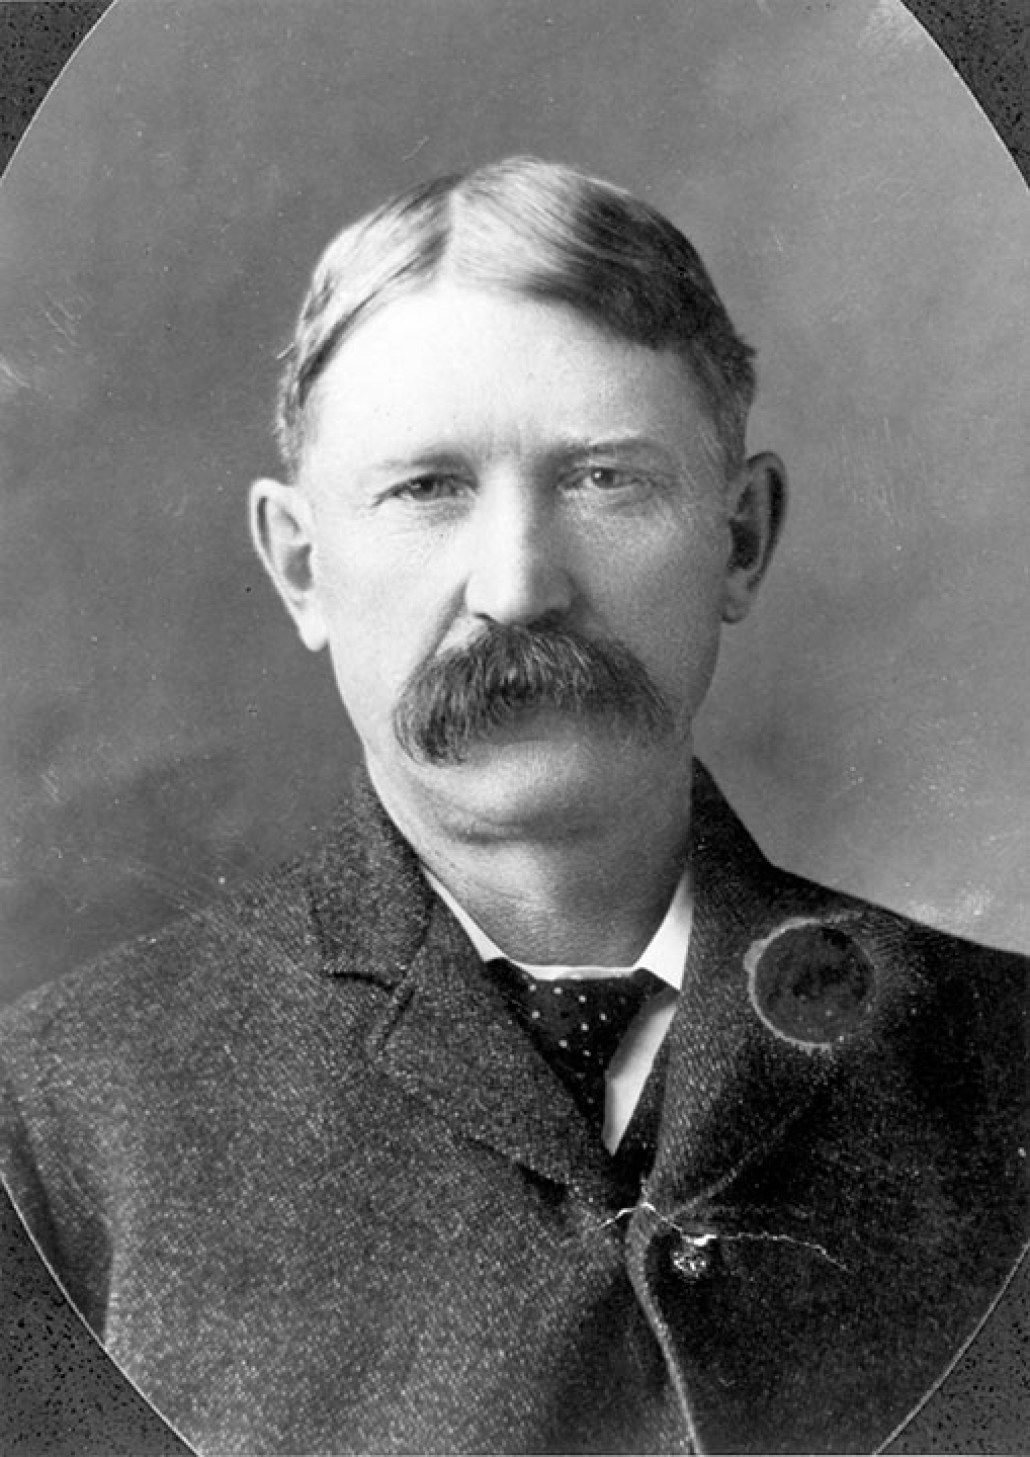 Richard Secord ca. 1905. Image courtesy of the City of Edmonton Archives.